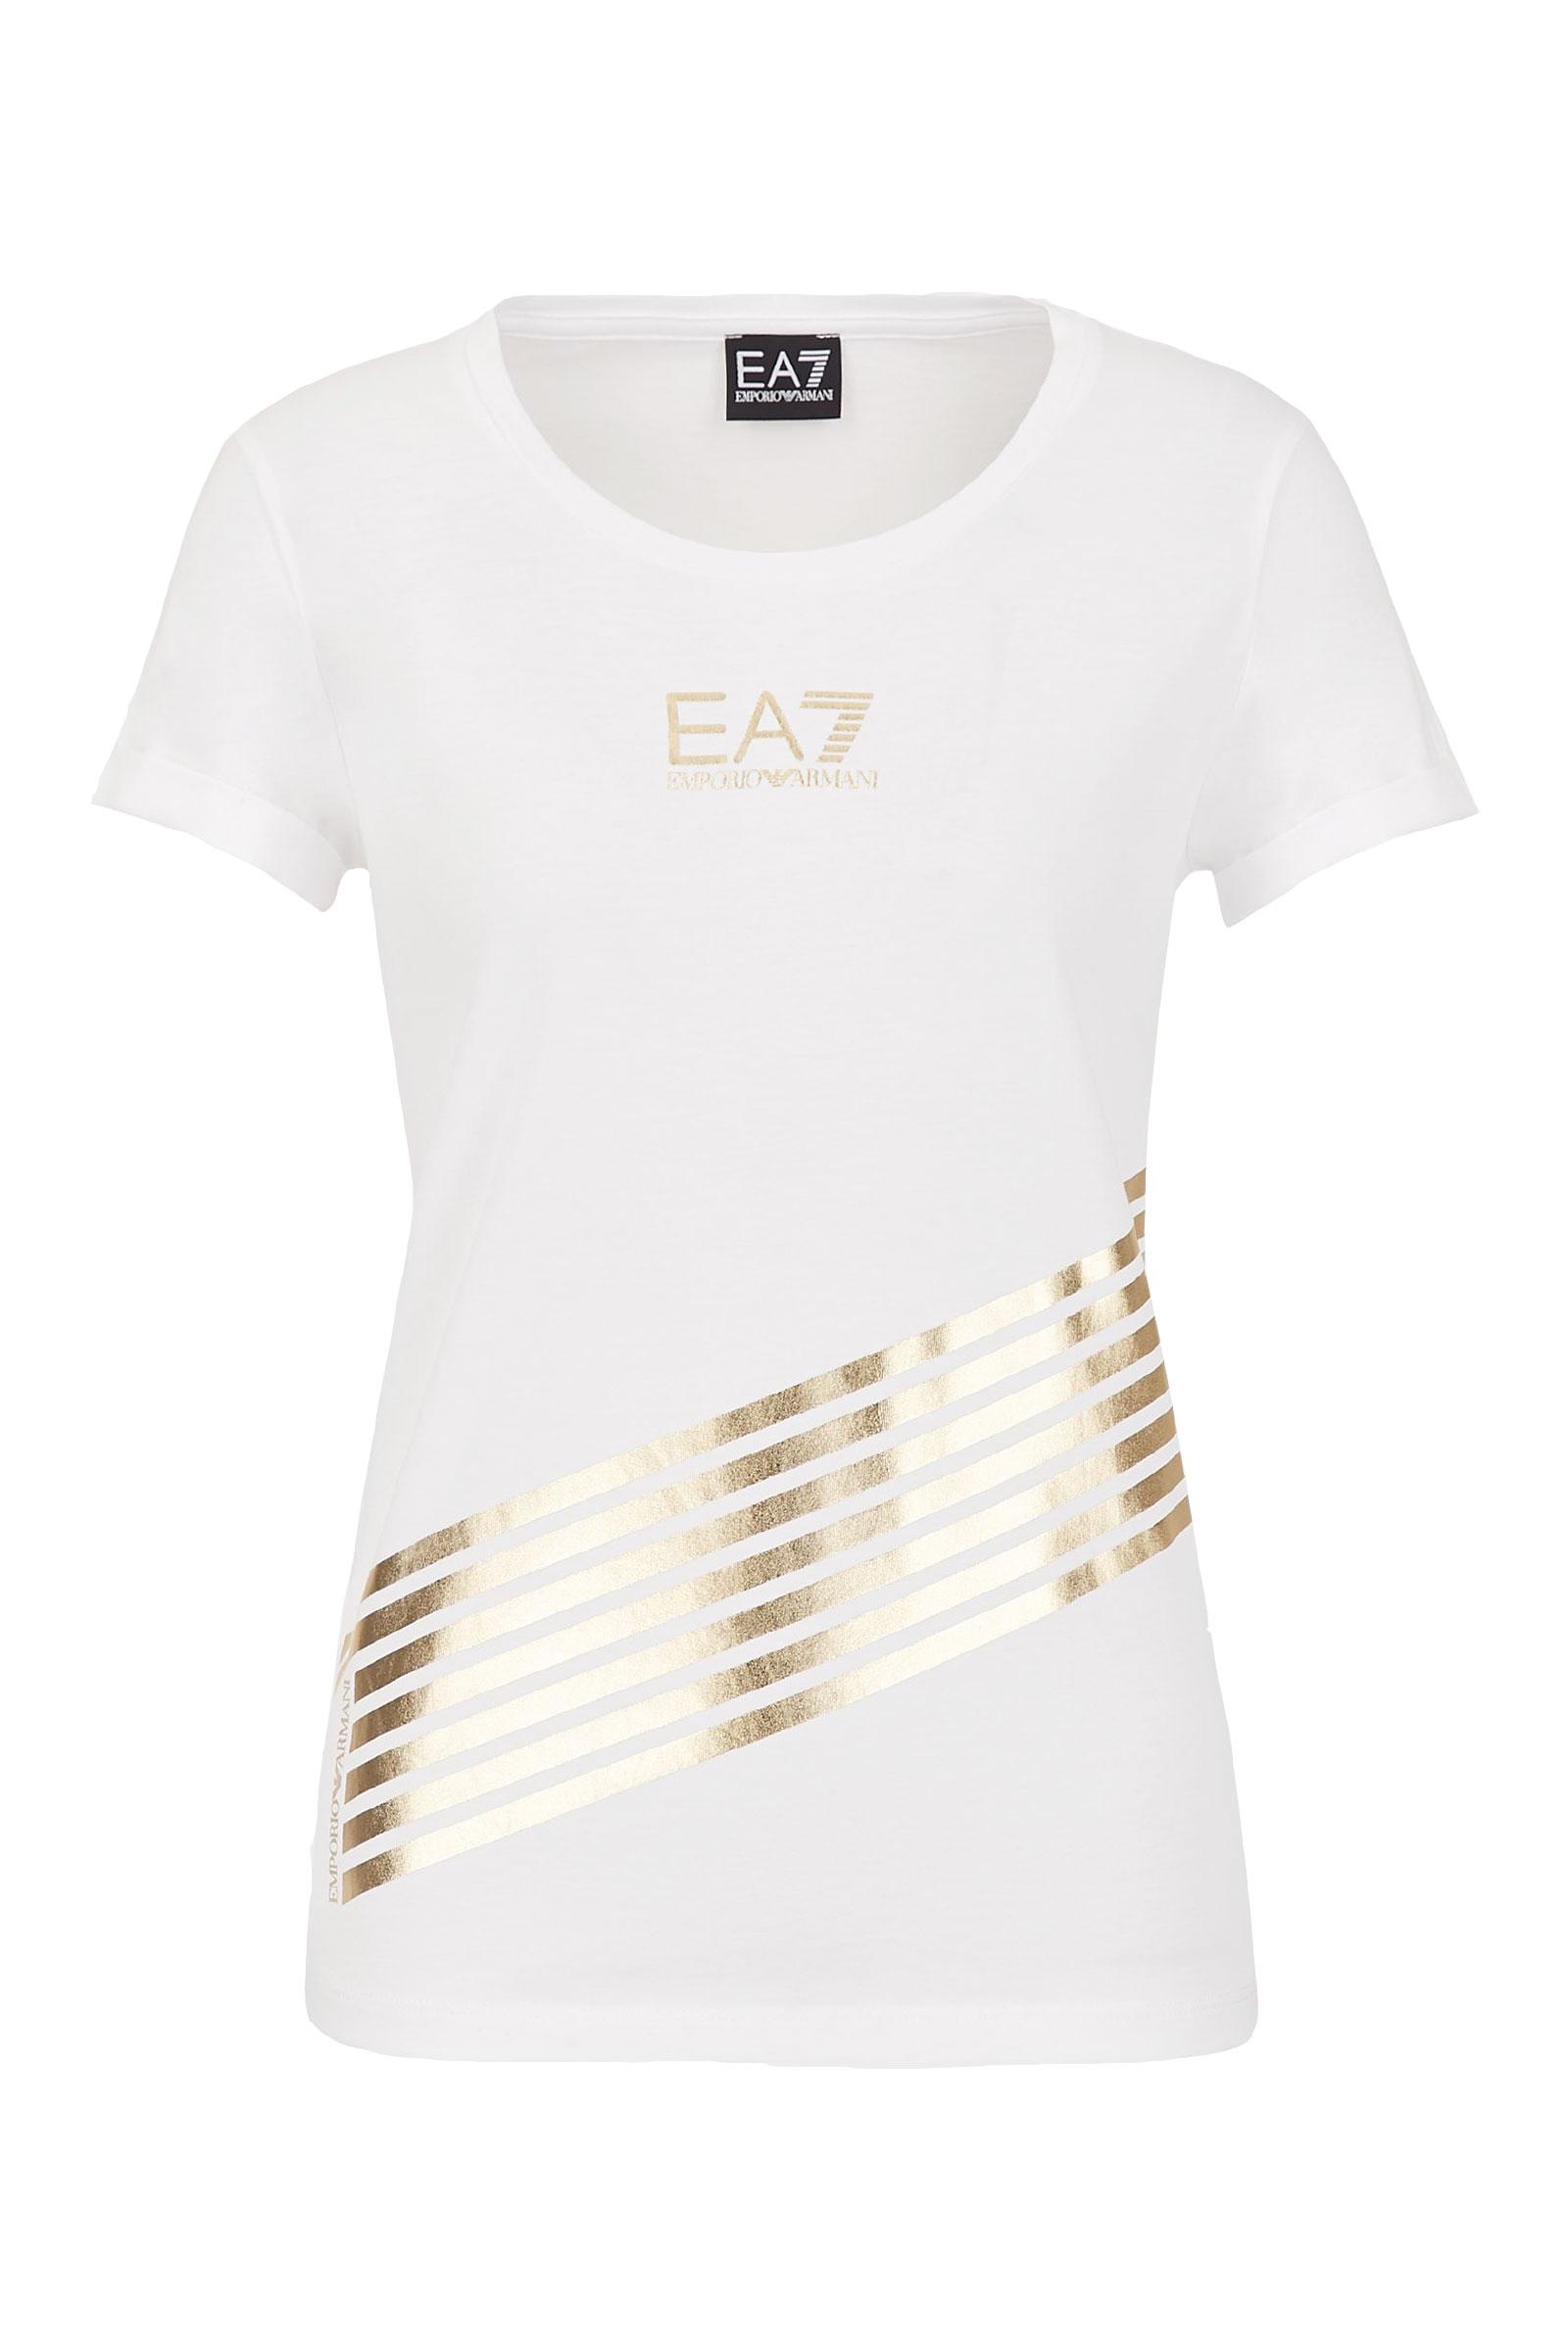 ARMANI EA7 Women's T-Shirt ARMANI EA7 | T-Shirt | 3KTT42 TJ52Z1100